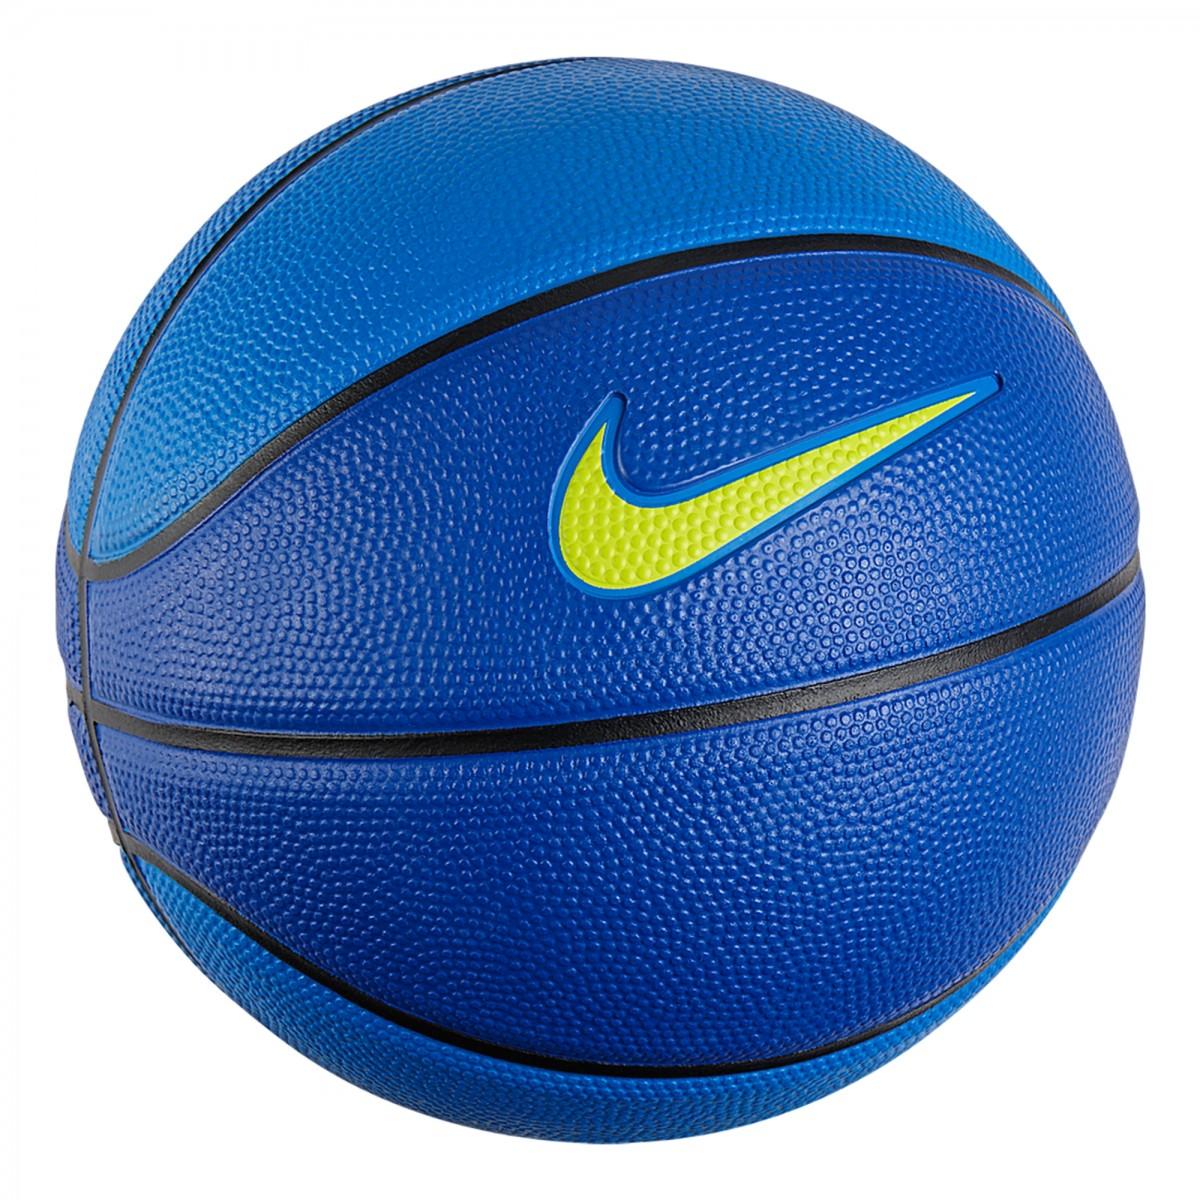 Bizz Store - Bola de Basquete Nike Swoosh Tamanho Mini e3e39a3ad81d1